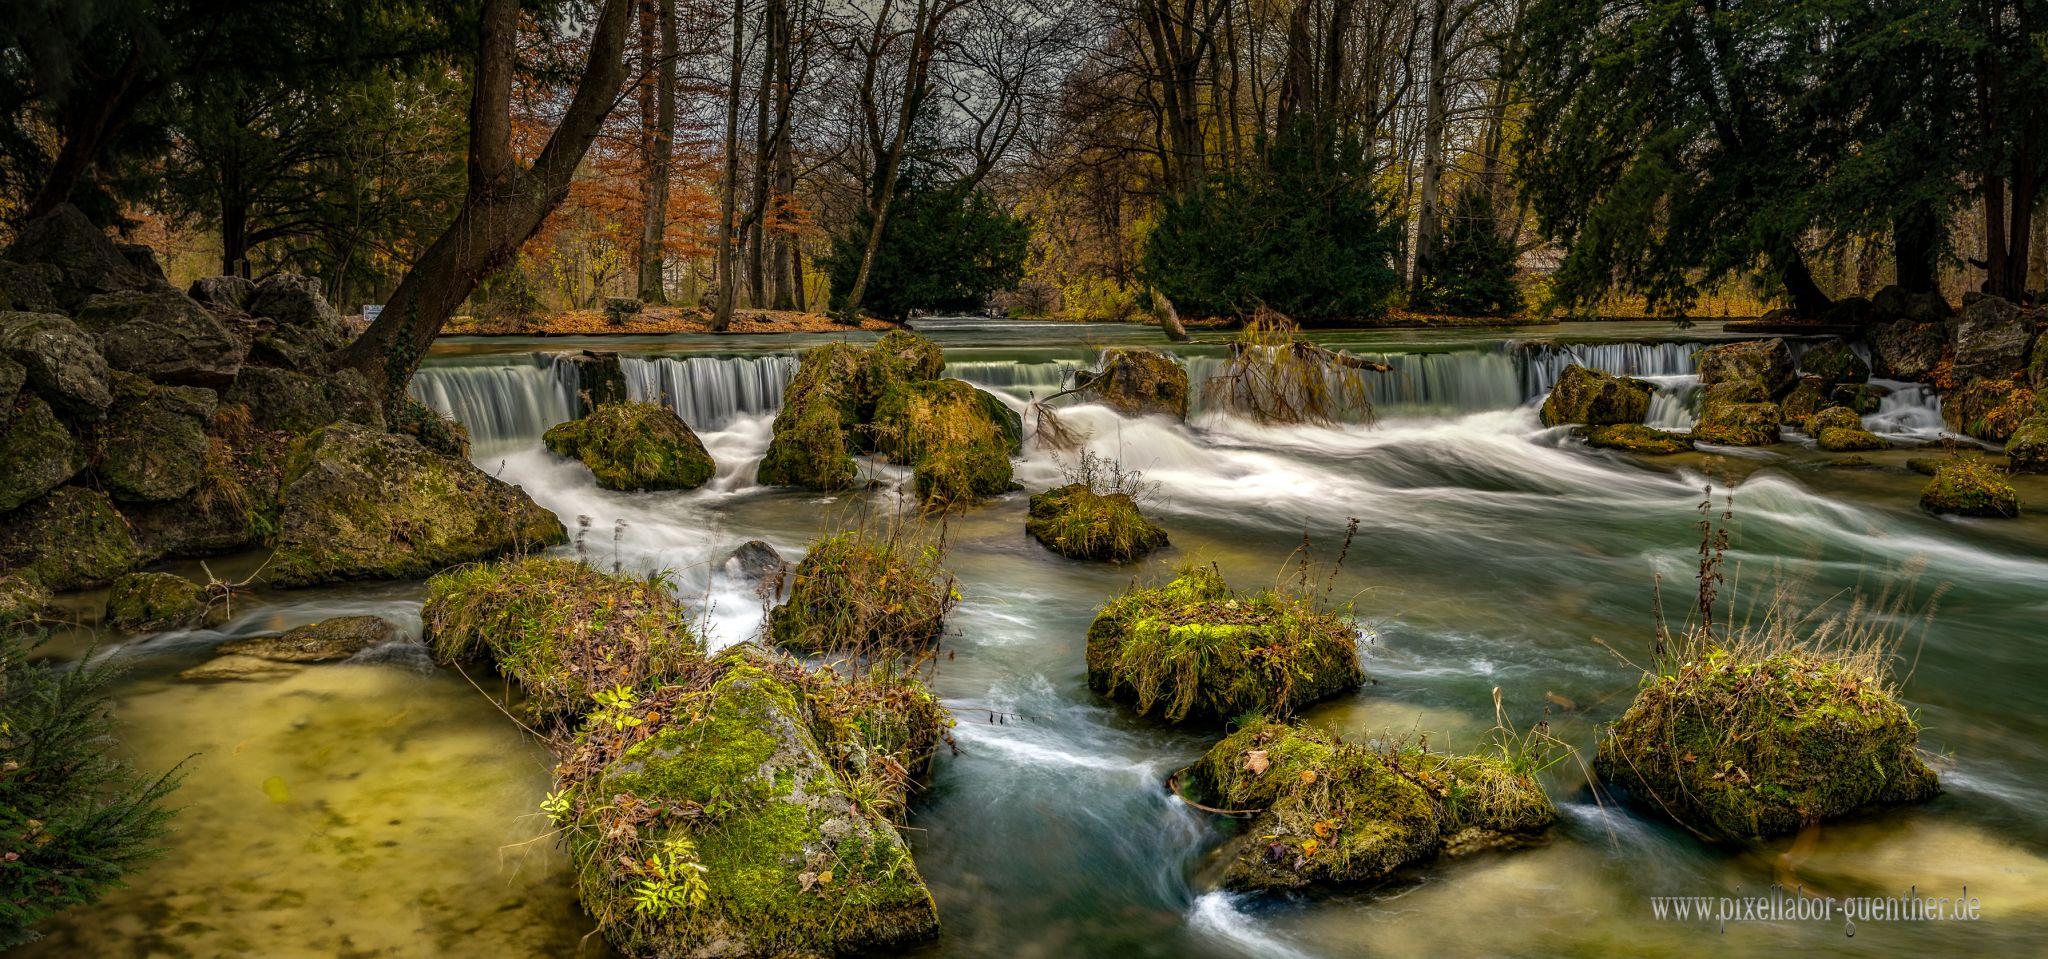 The English Garden, Germany